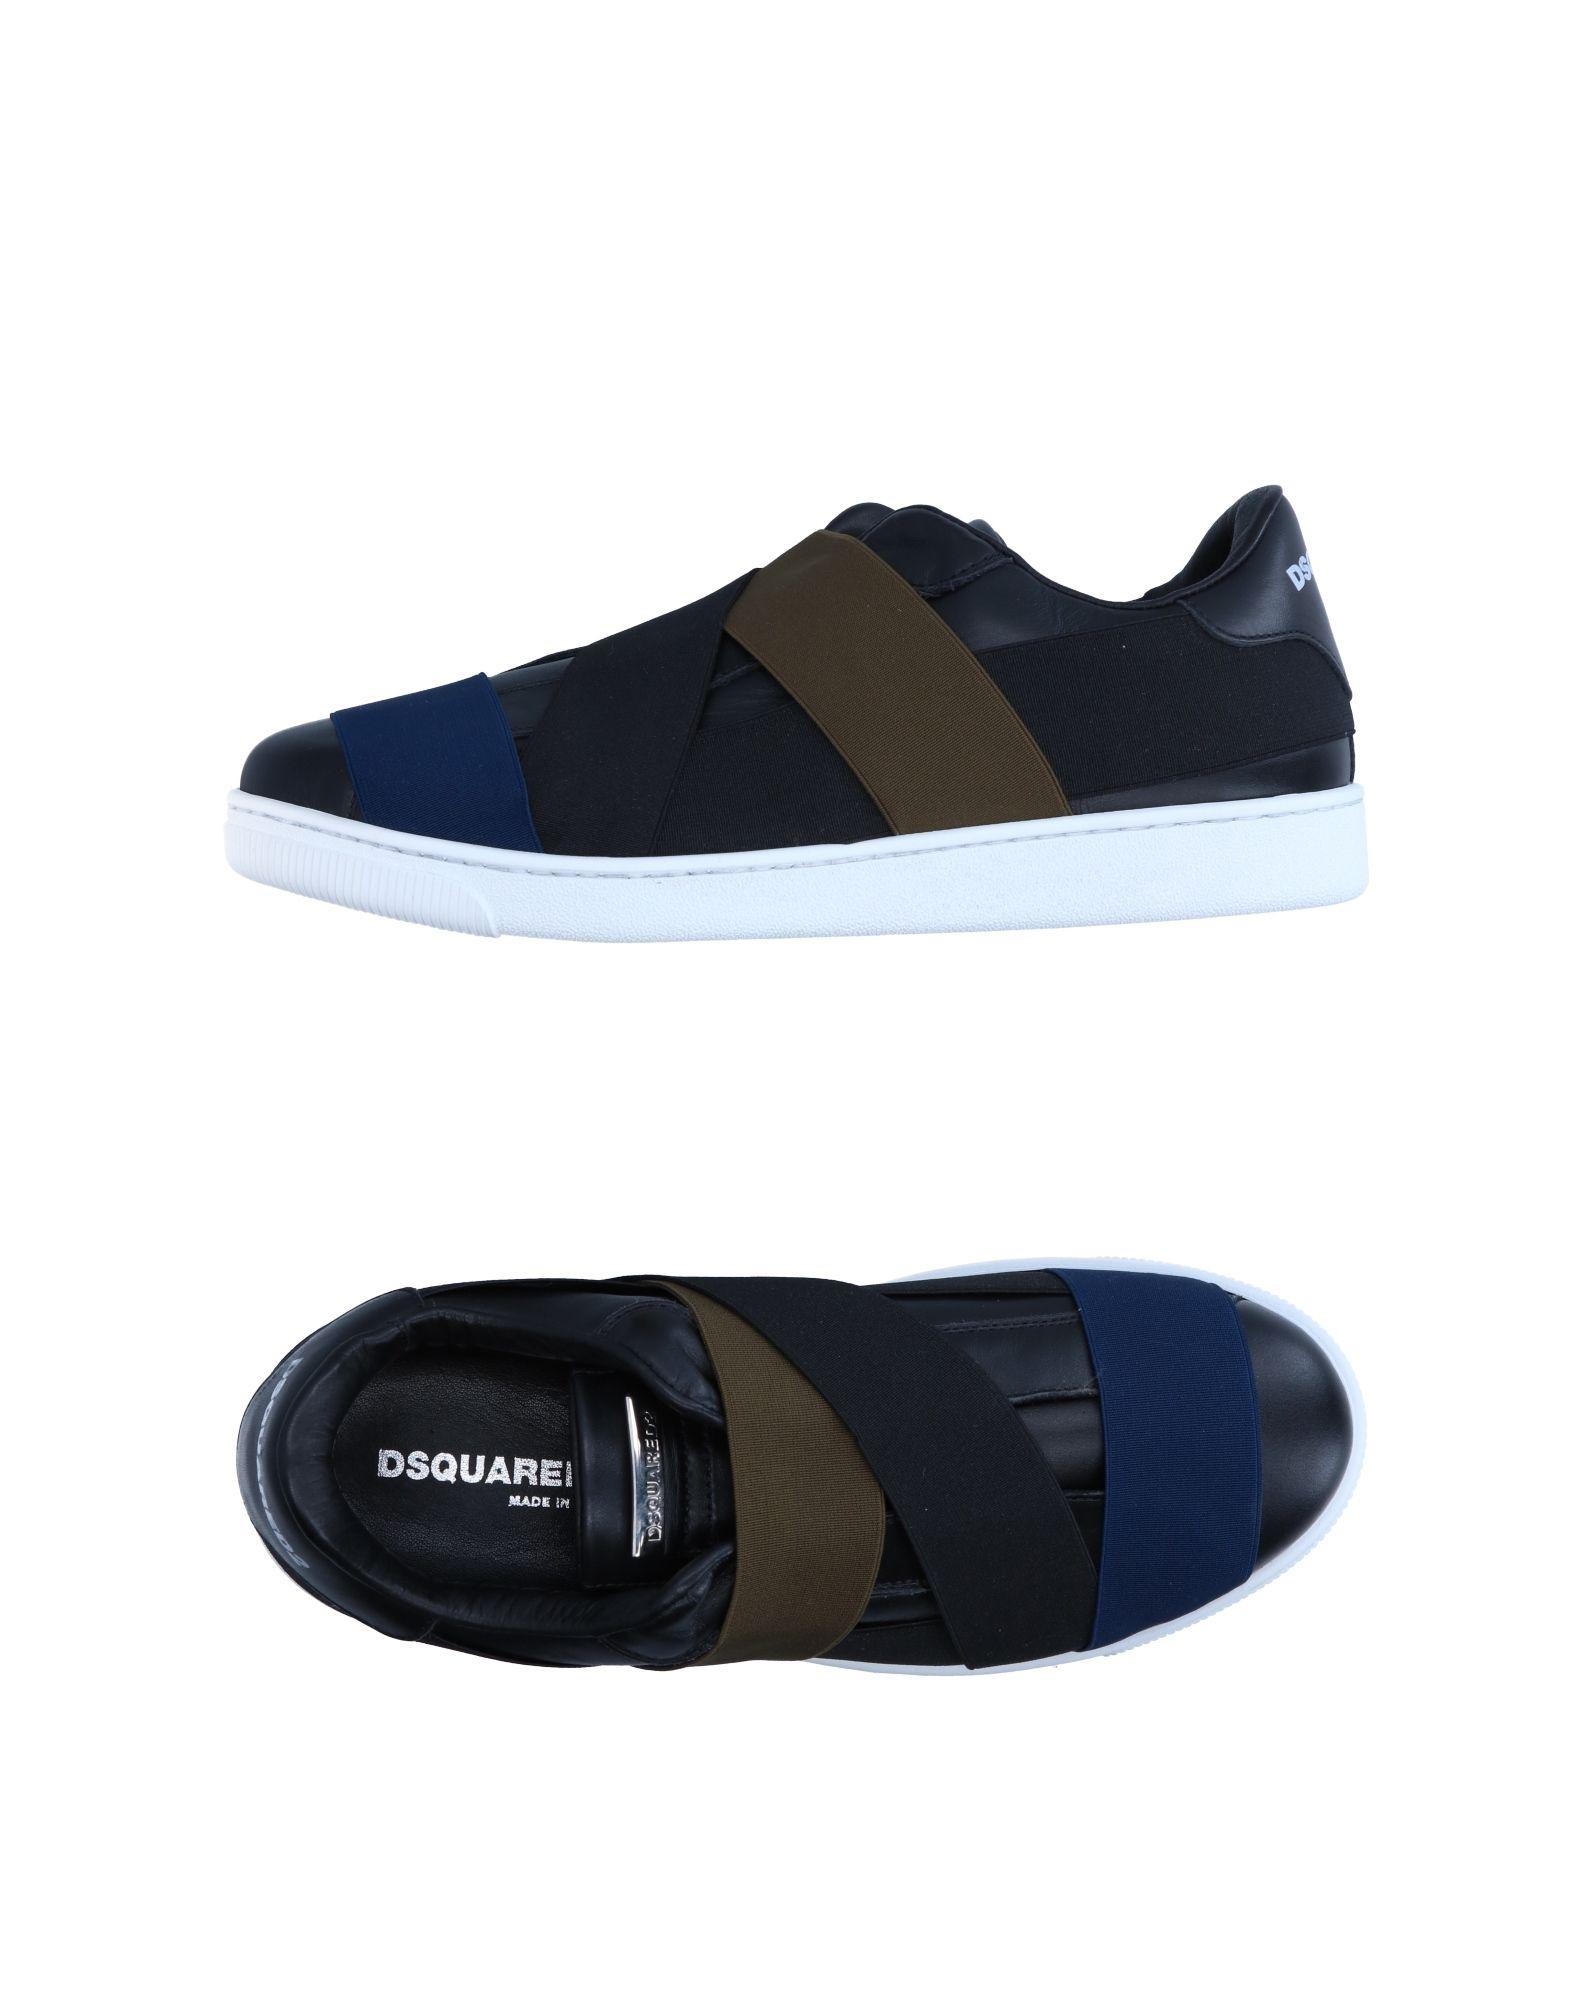 Dsquared2 Sneakers Herren  11267837AR Gute Qualität beliebte Schuhe